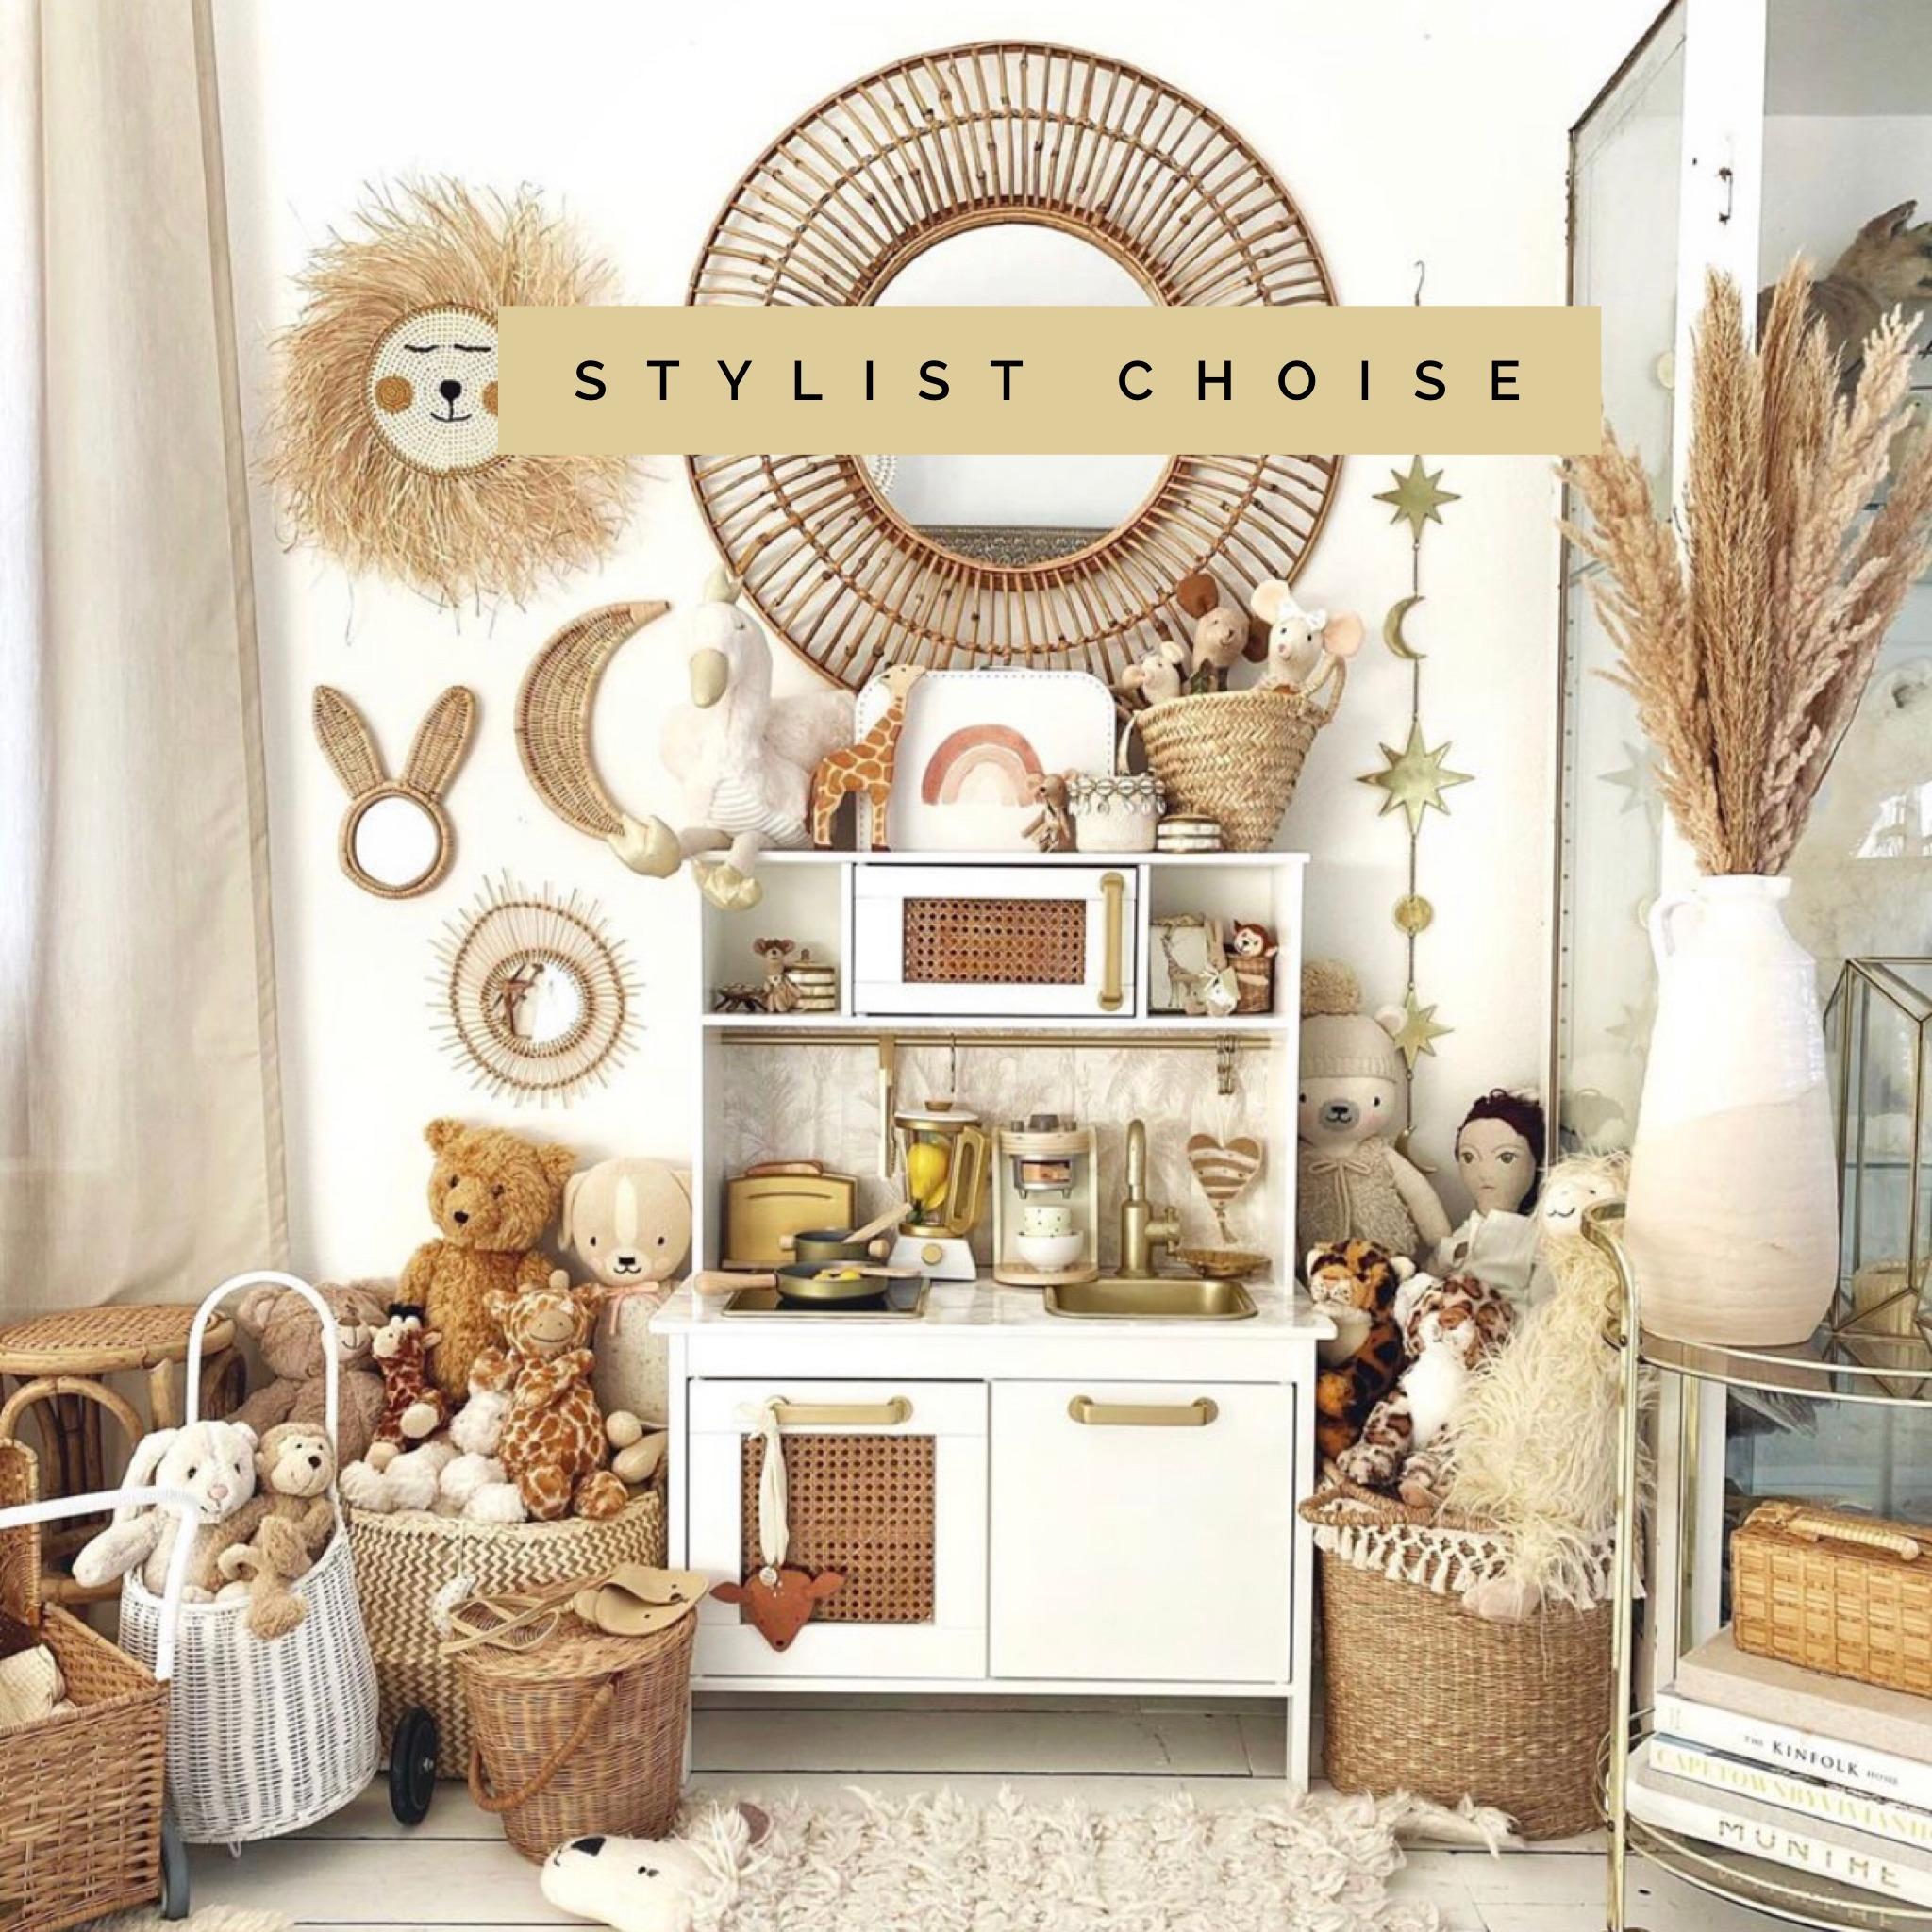 Stylist's Choise